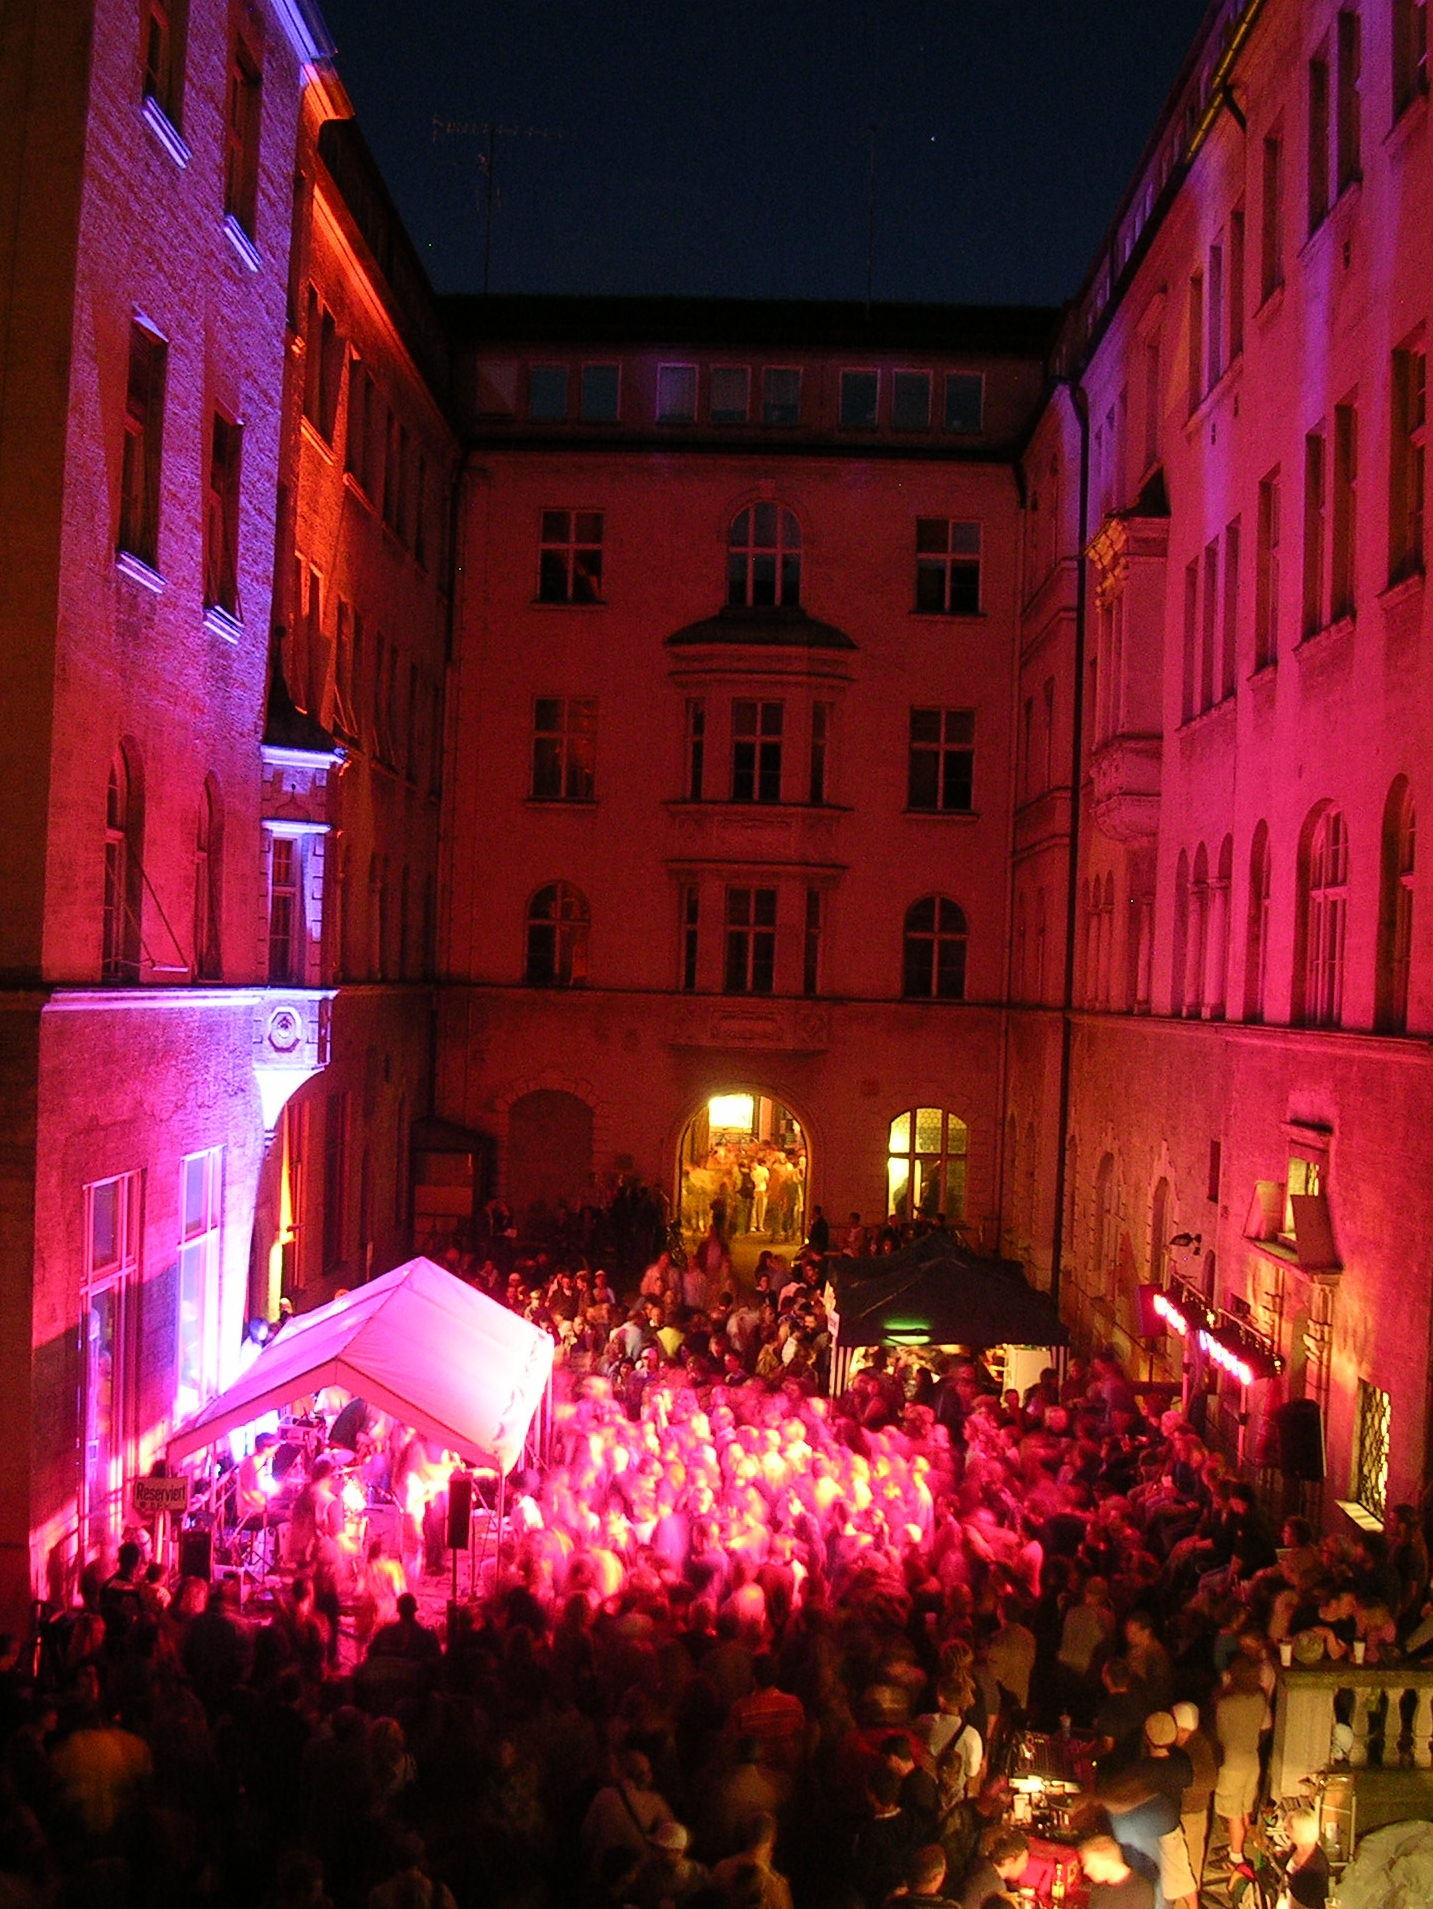 Konzerte im Bürgerhof 2007 - Freiwilligen-Zentrum Augsburg - Foto: Robert Hösle Illumination: Wolfgang F. Lightmaster